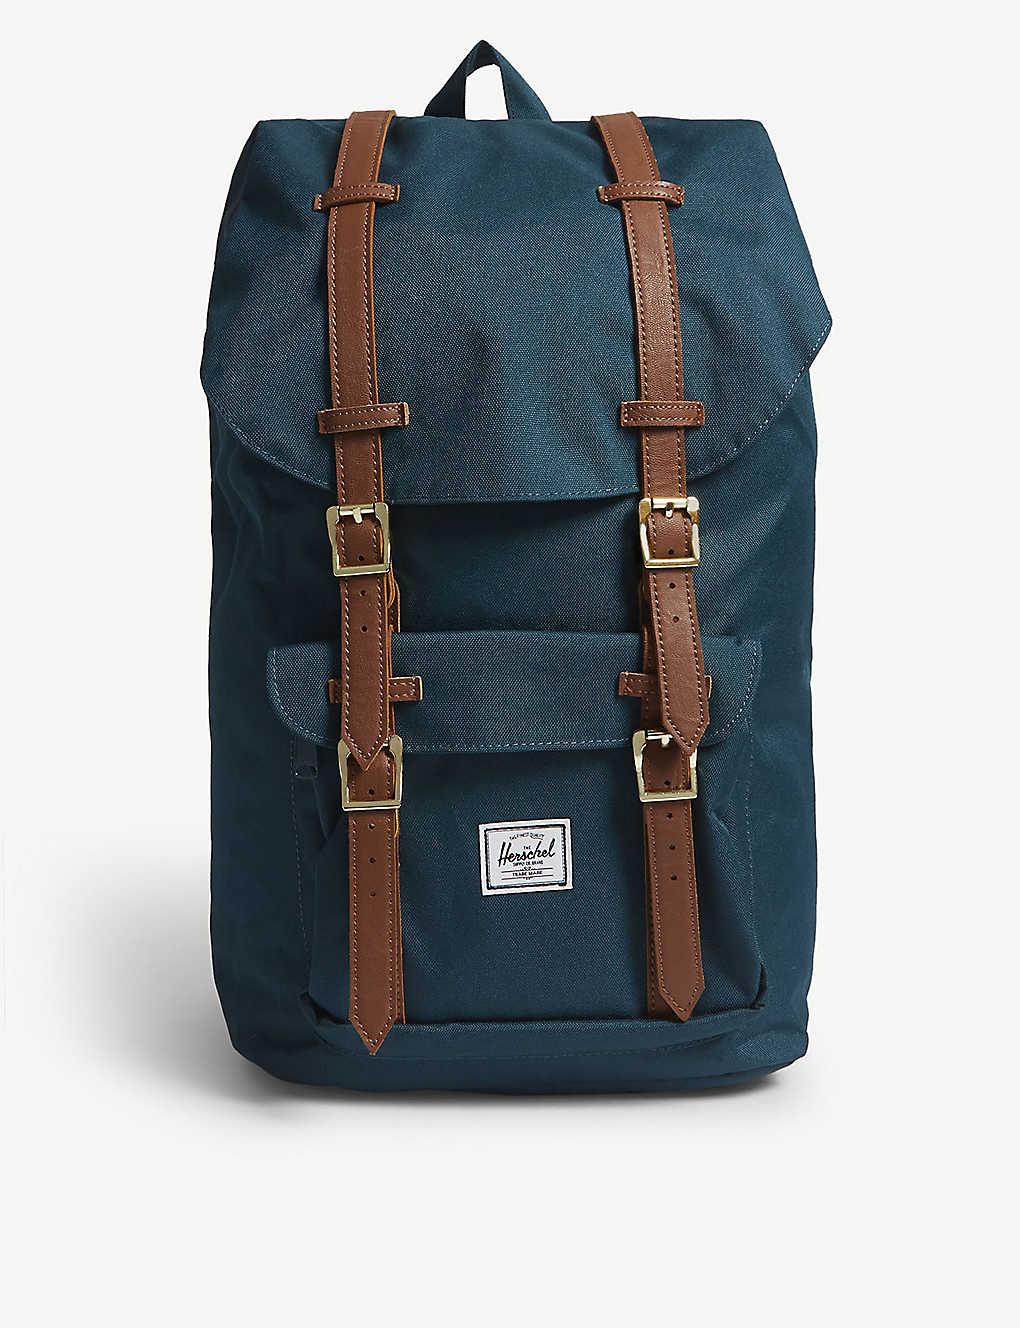 6f22349c5 HERSCHEL SUPPLY CO - Little America canvas backpack | Selfridges.com